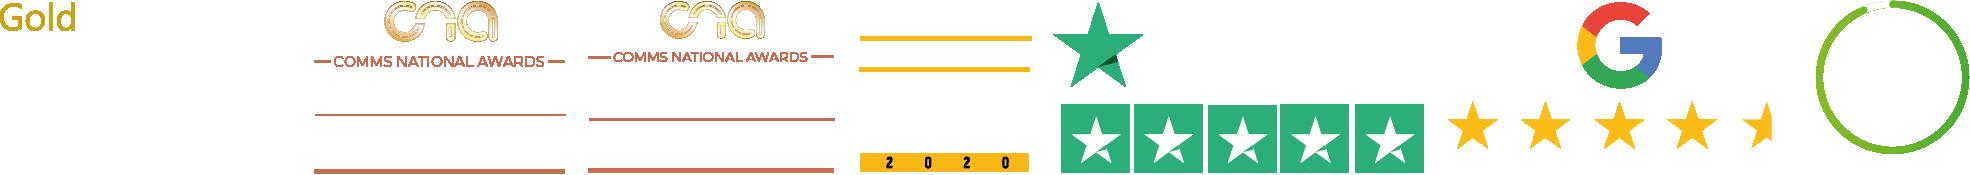 wholesale homepage accreditations